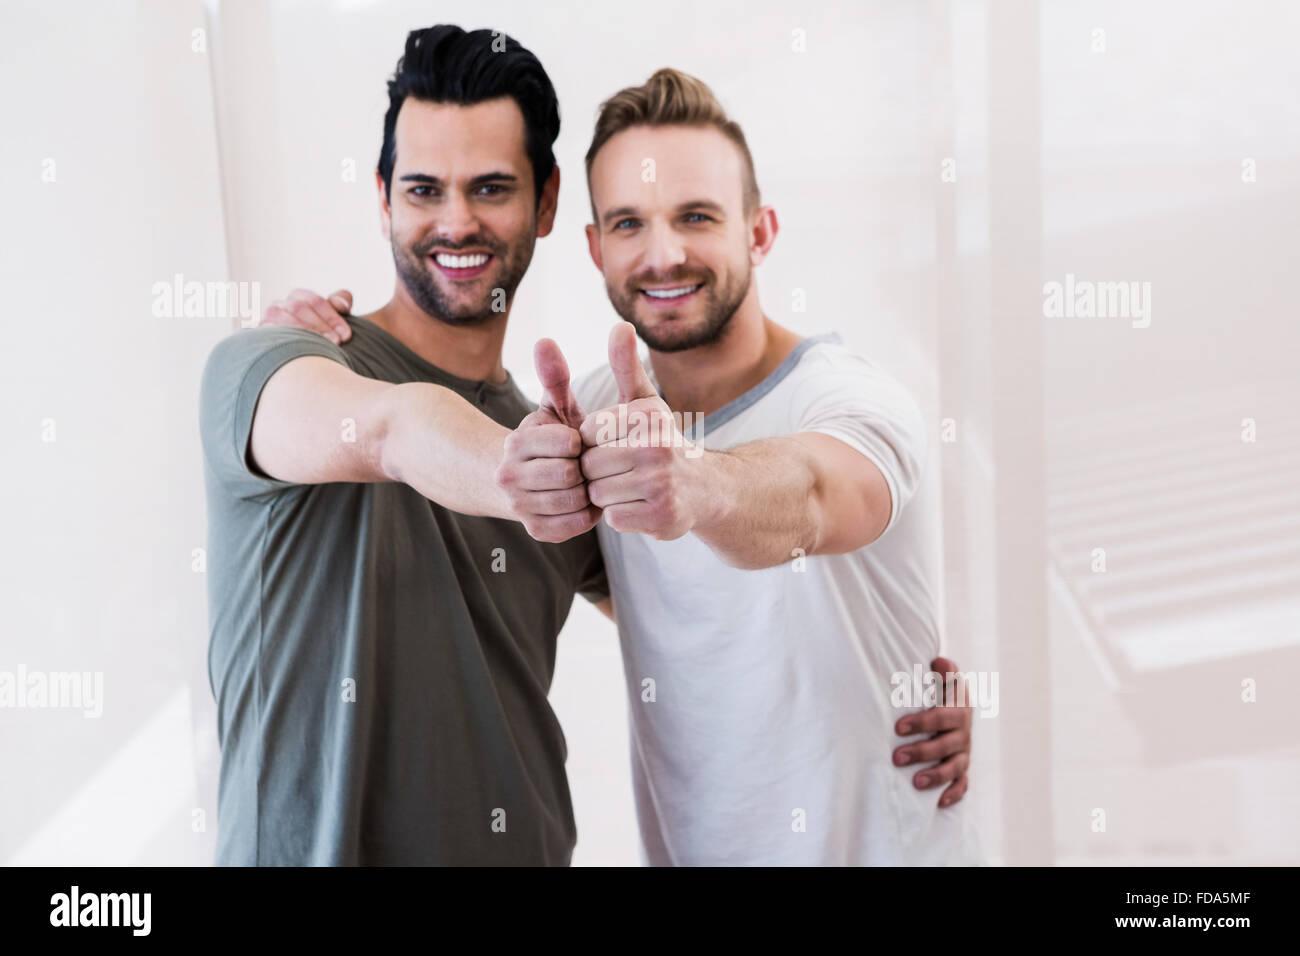 Gay thumbs photos 5